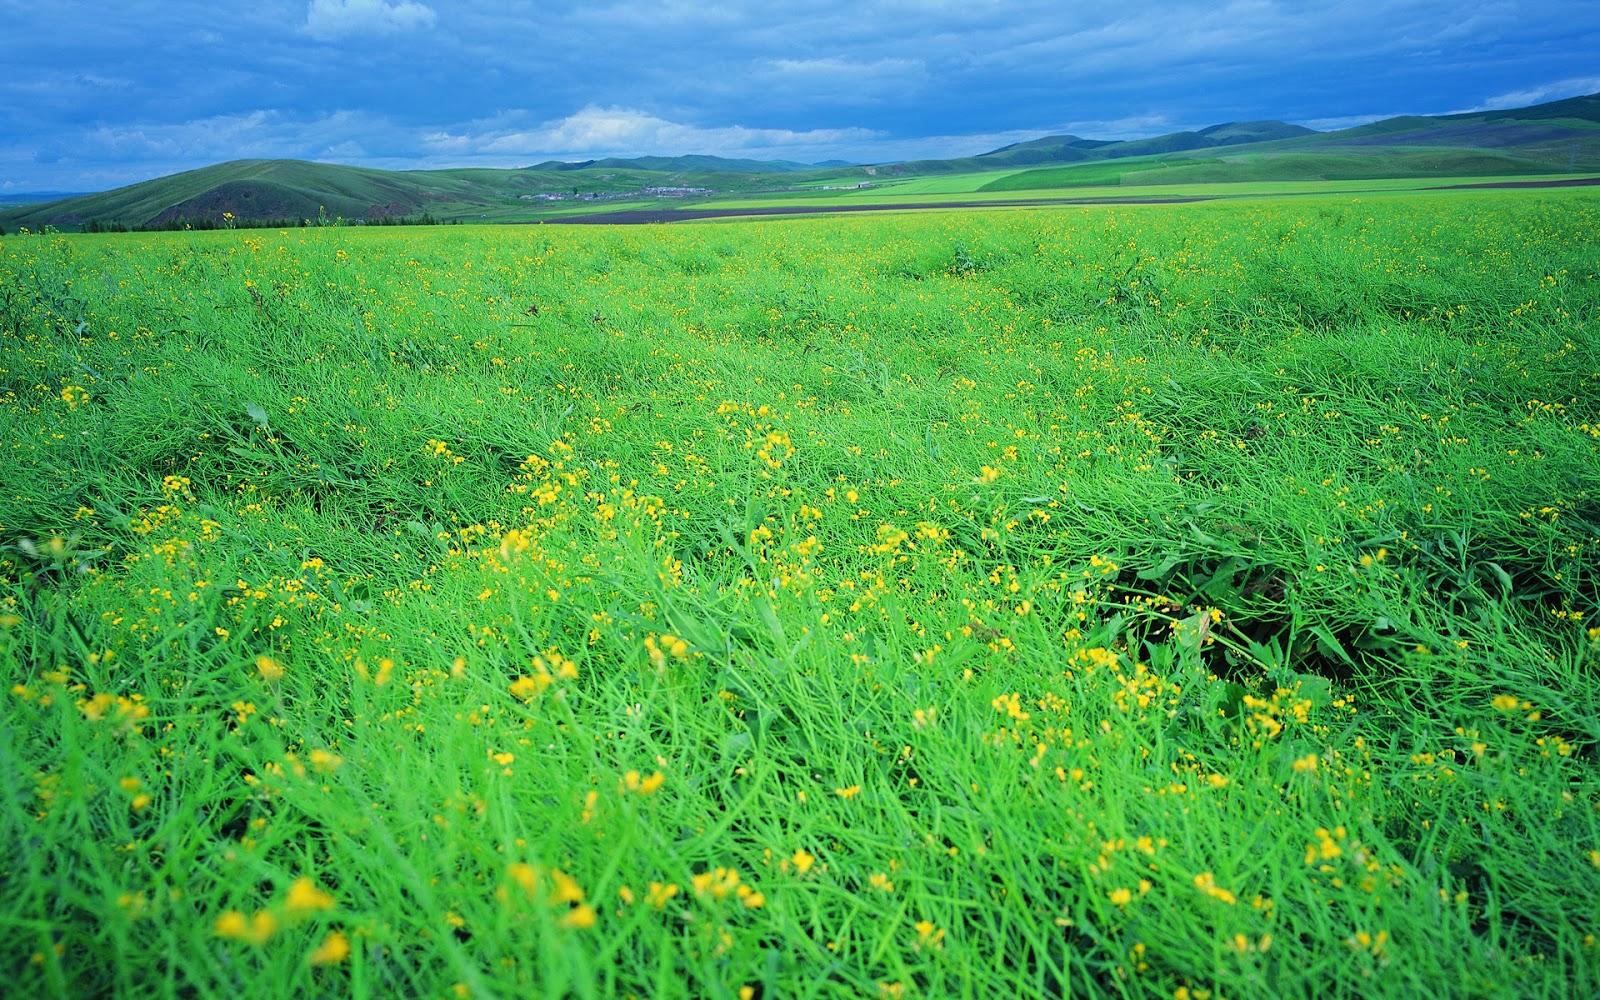 Green Fields in Green Mountain Wallpaper Widescreen Mobile 1600x1000